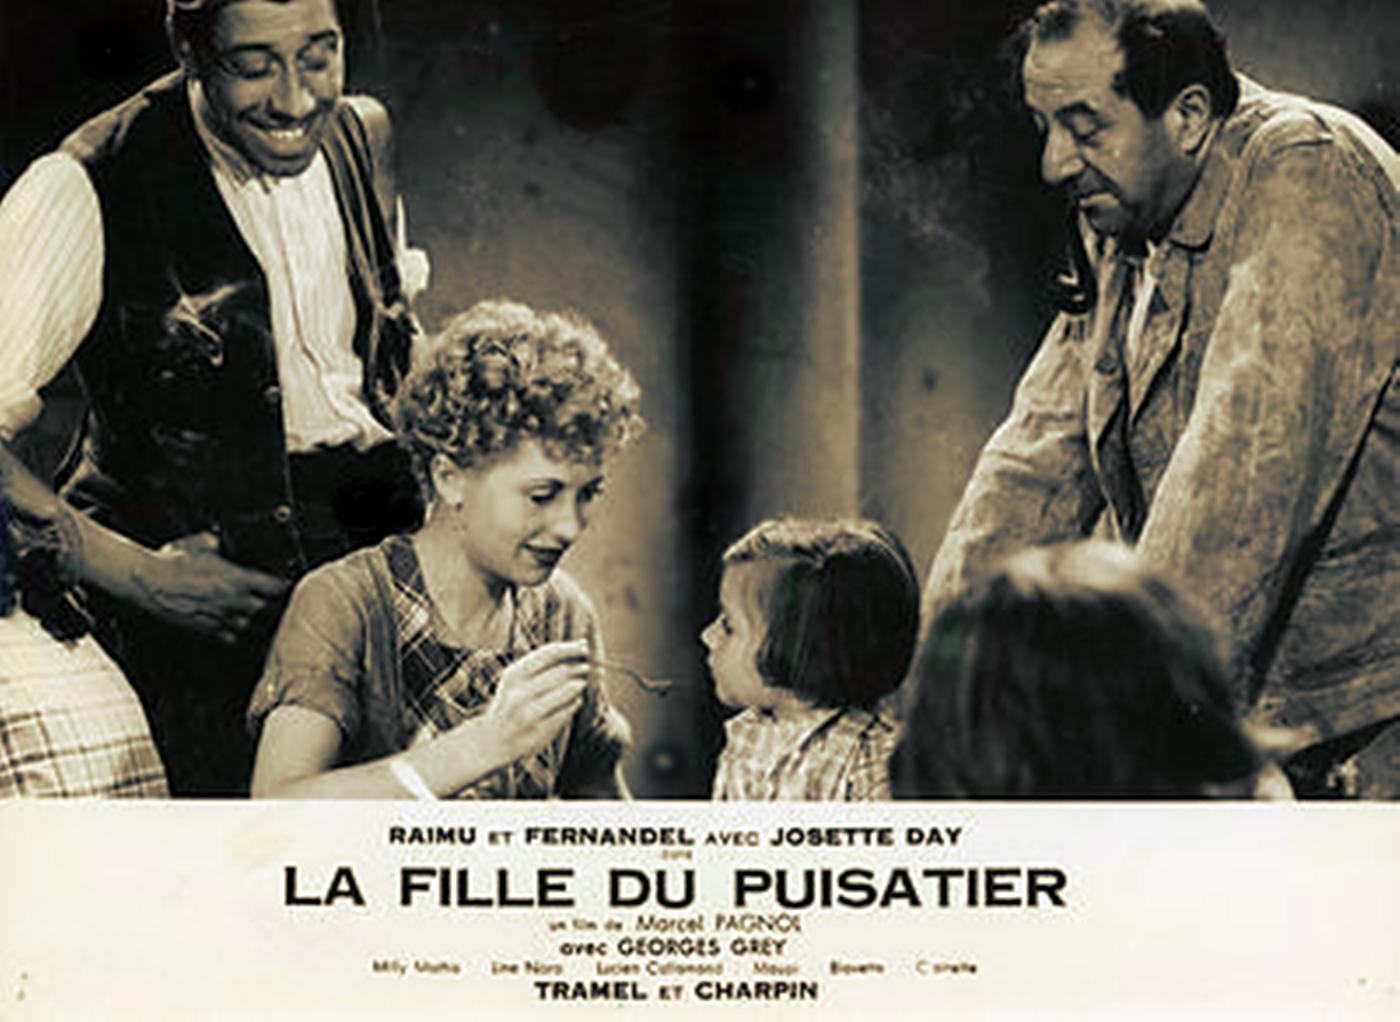 La-Fille-Du-Puisatier - Raimu-Fernandel-Pagnol